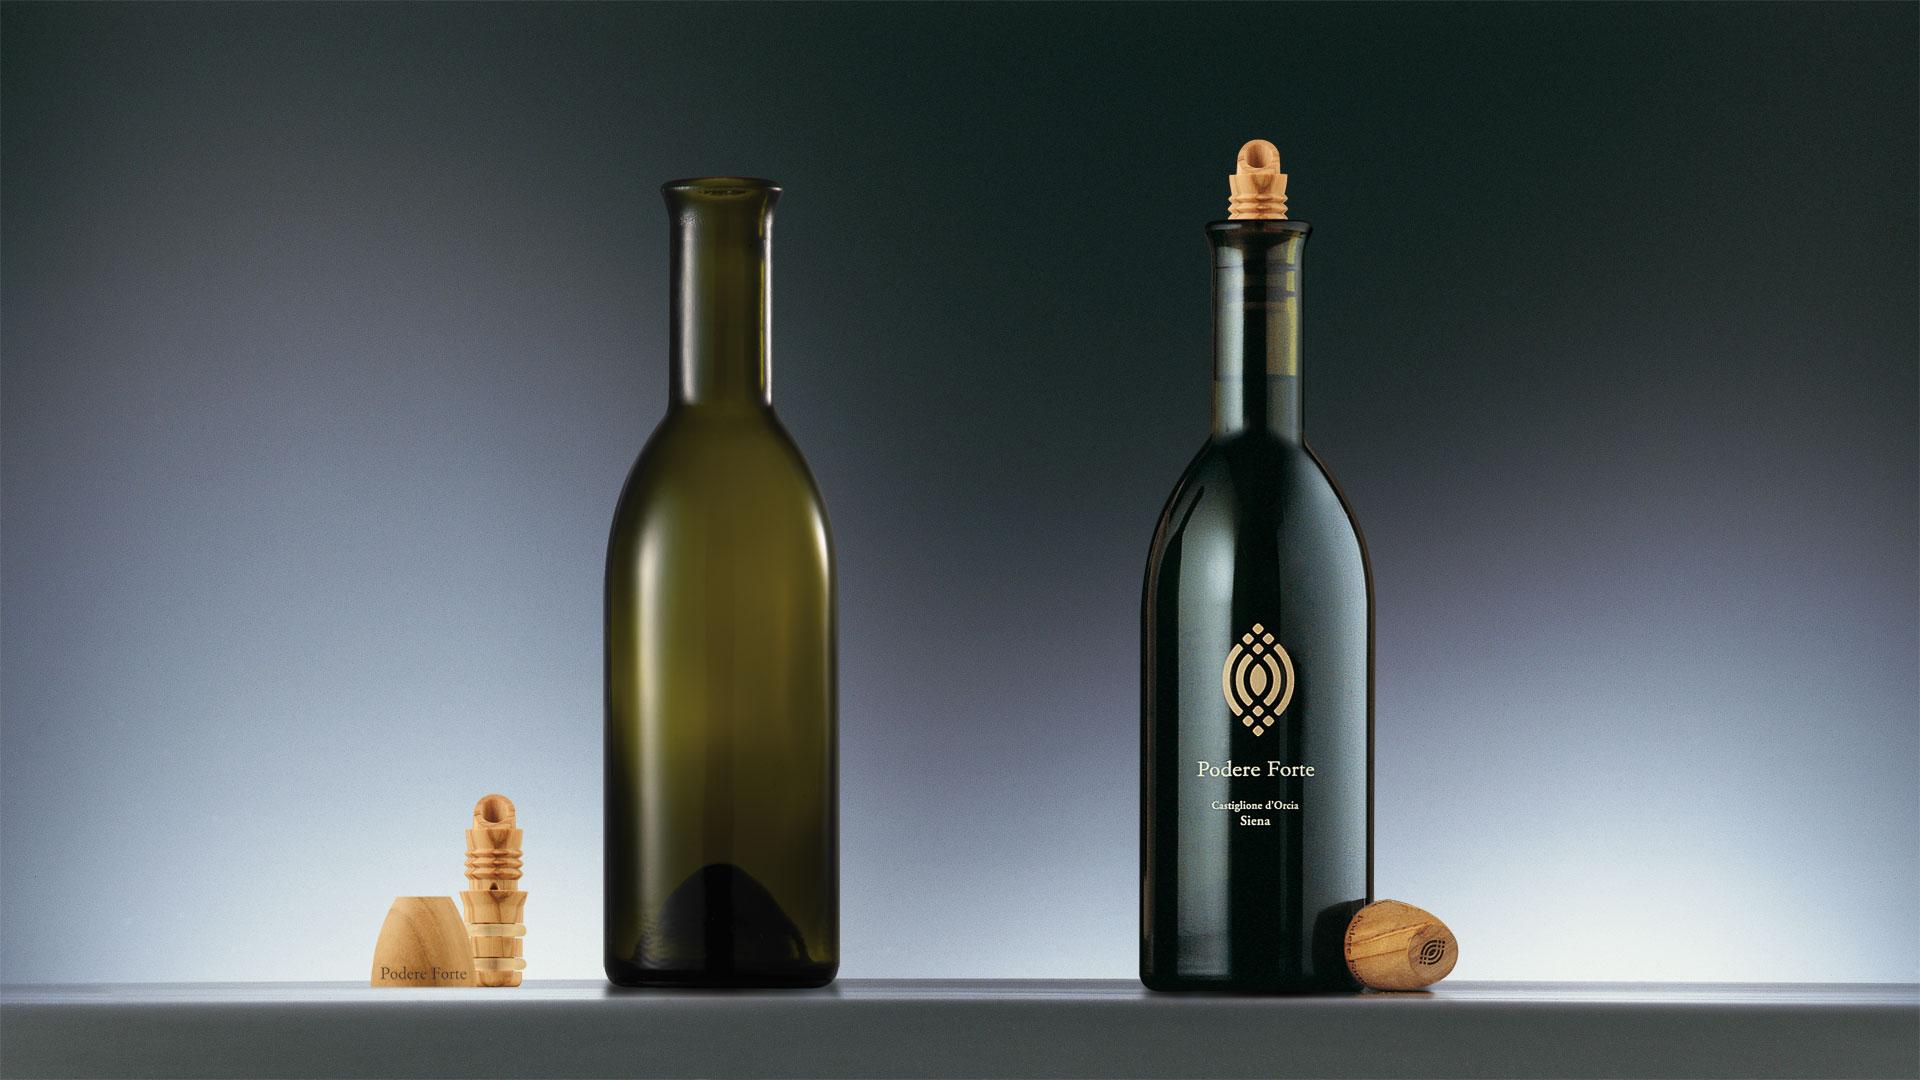 Podere Forte Olio bottle design